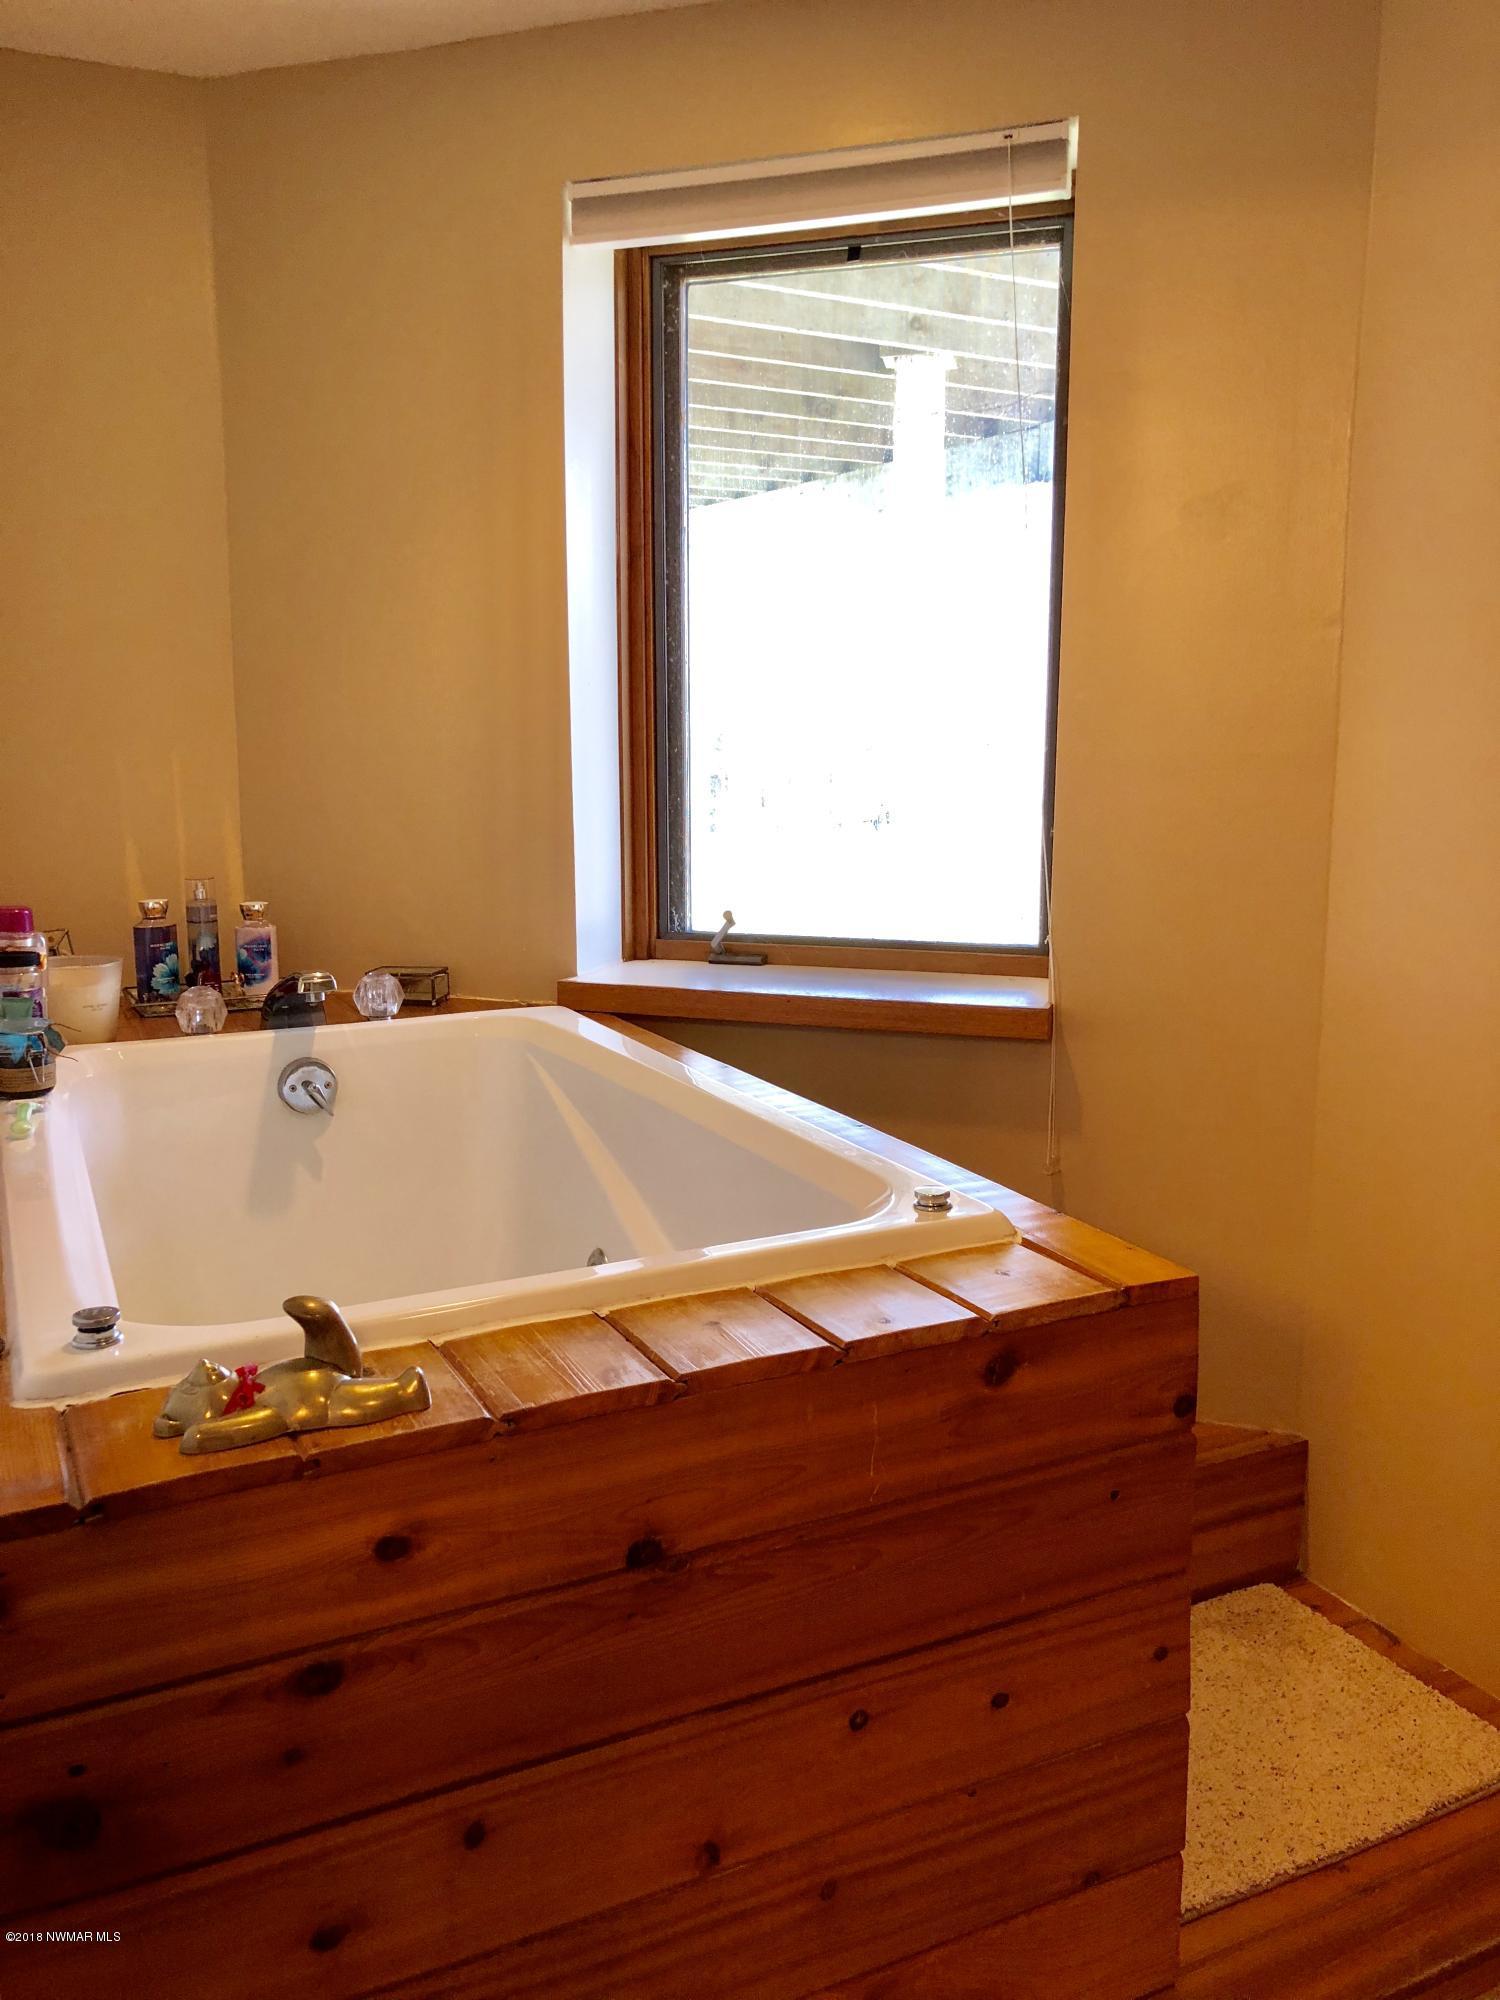 Master bedroom whirlpool tub with views of Lake Bemidji